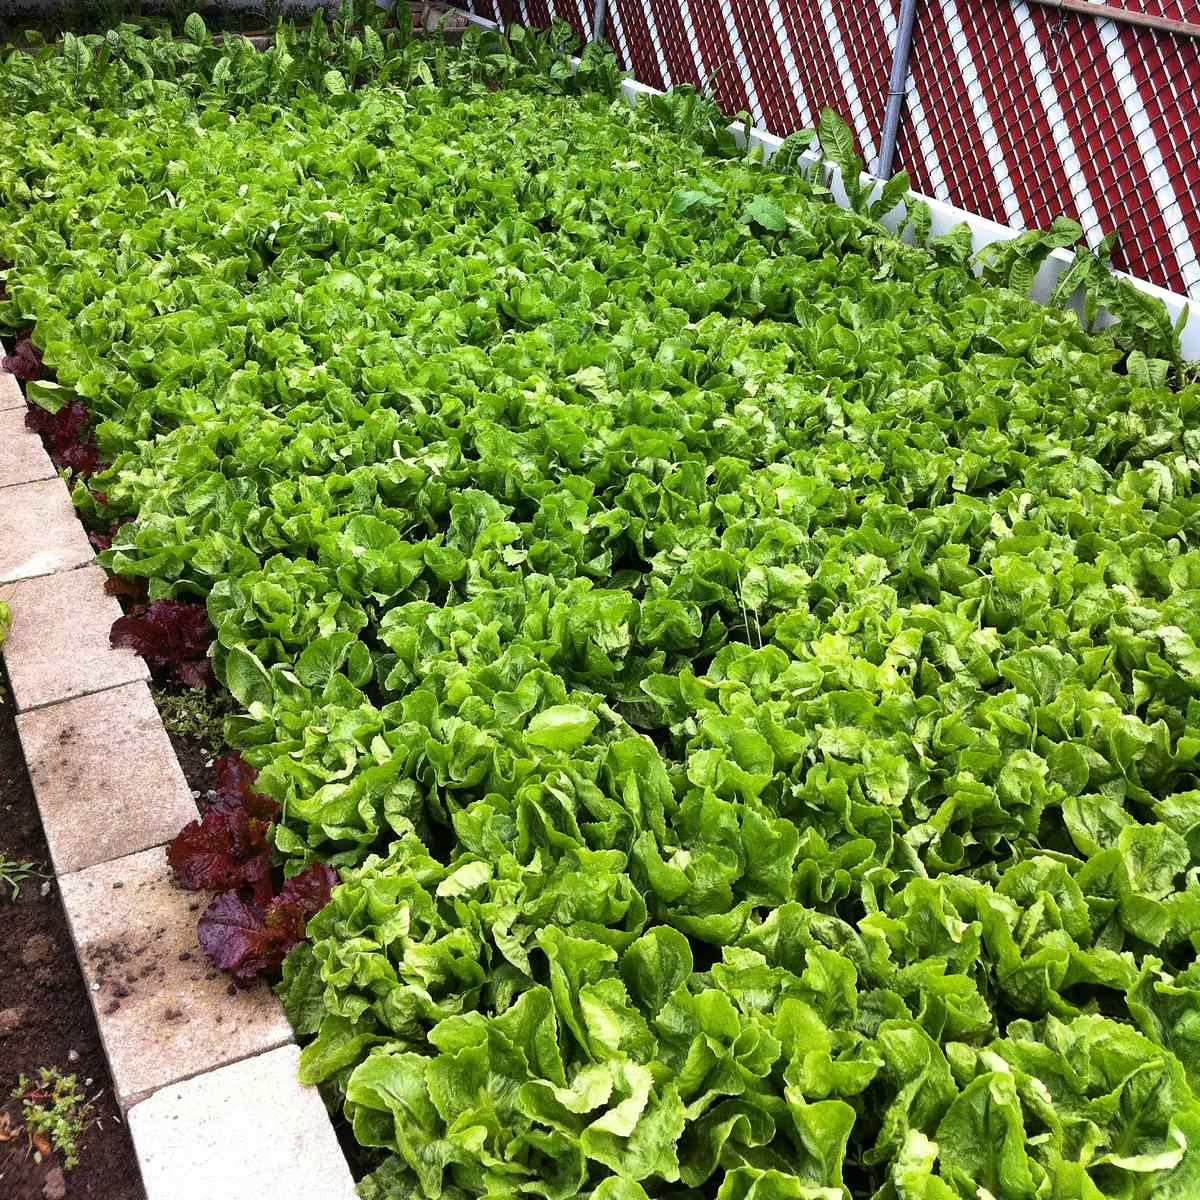 Collard greens growing in a garden.